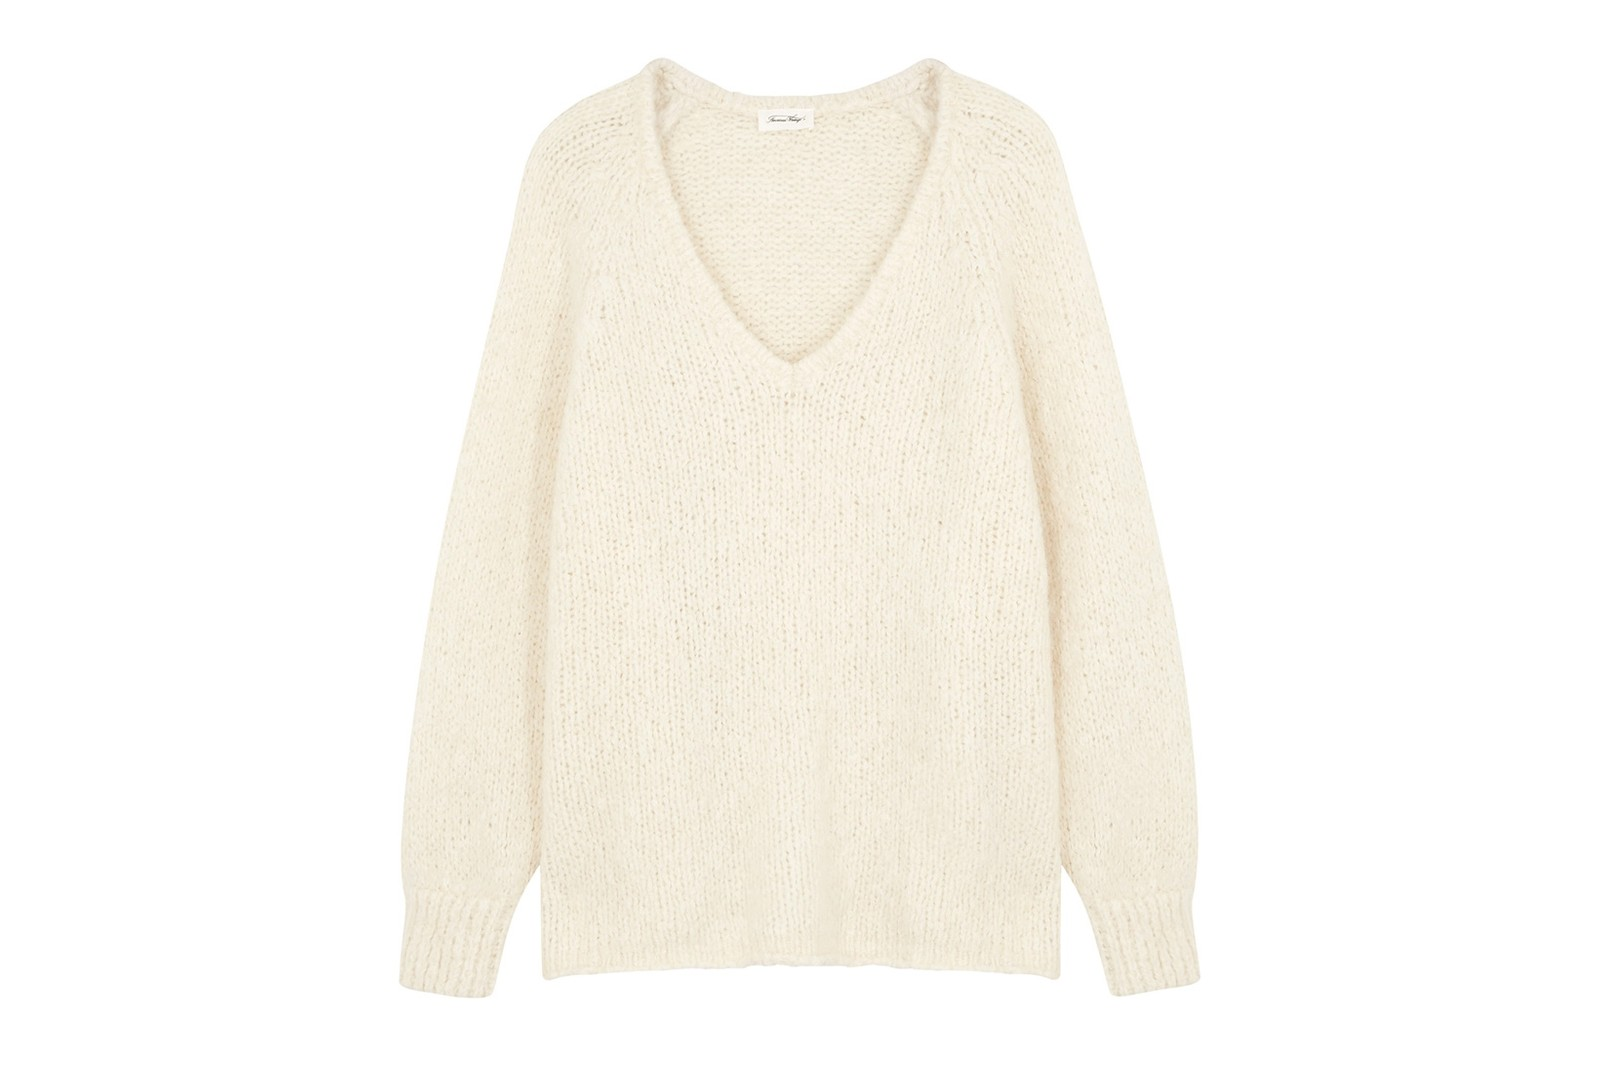 best knit sweaters lightweight fall jumper cardigan toteme nanushka jacquemus telfar turtleneck crewneck